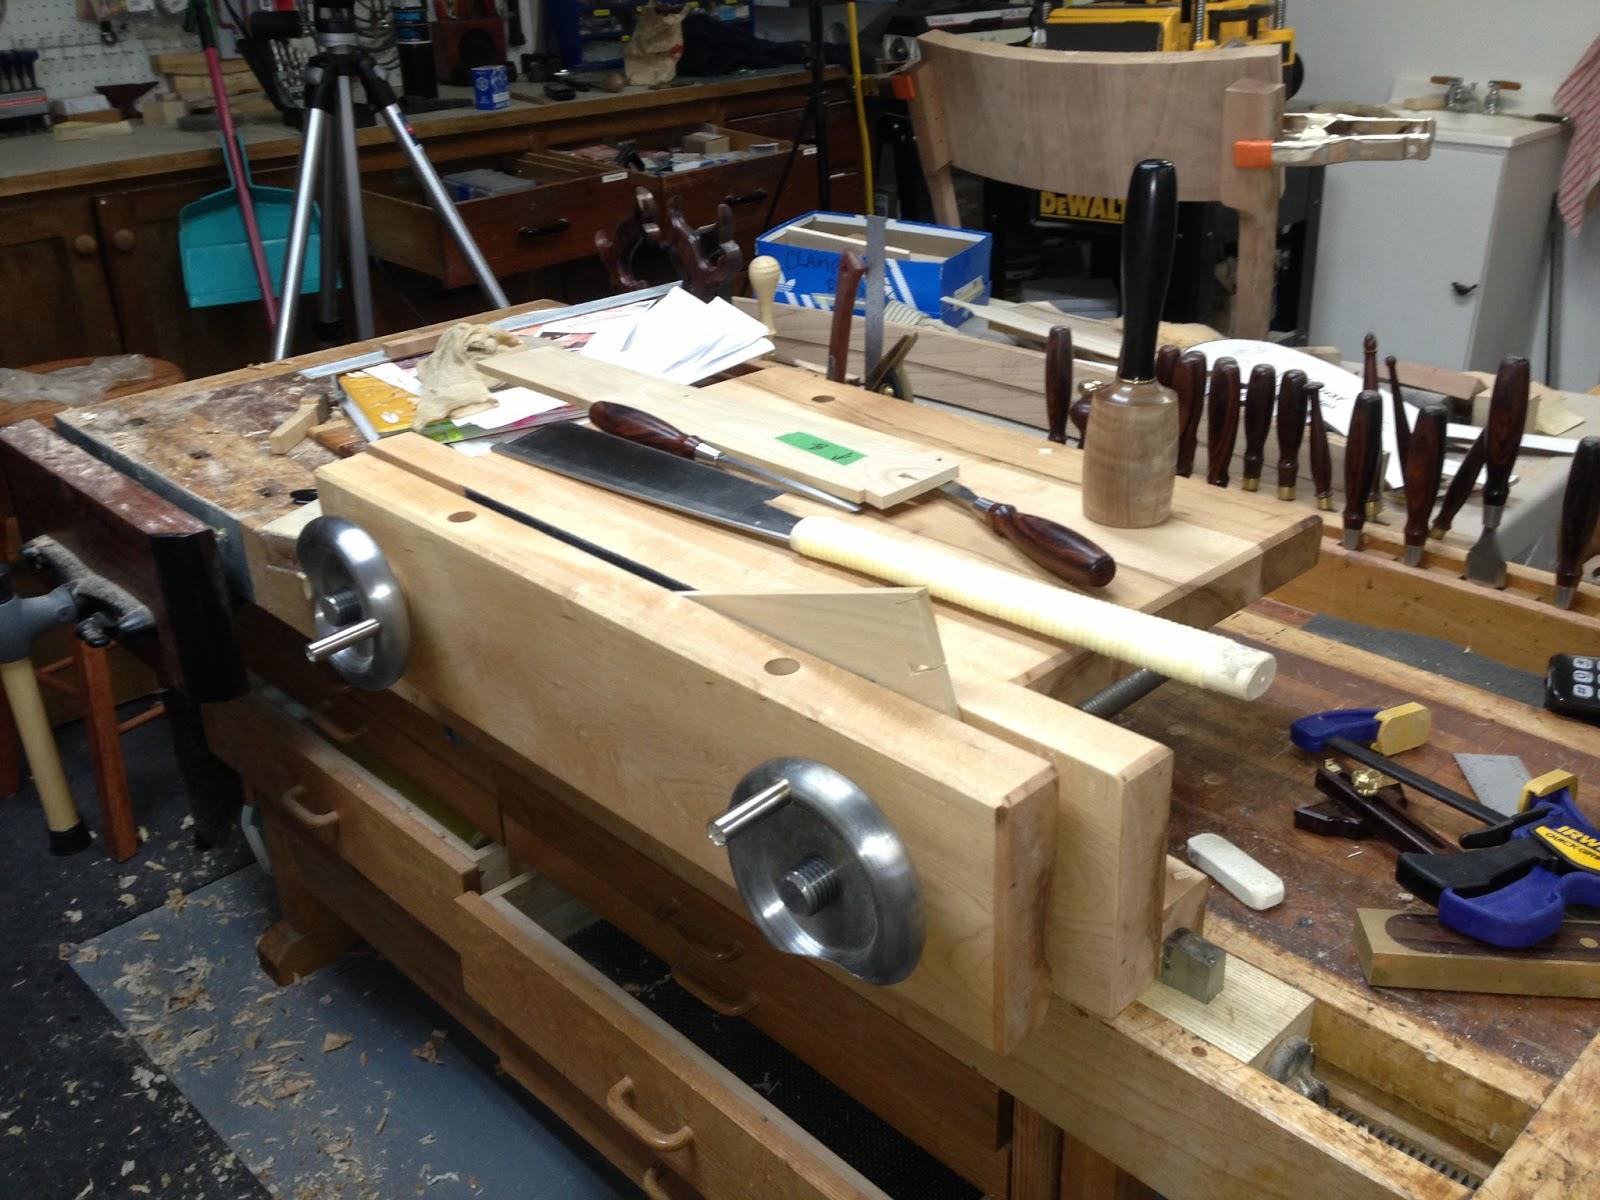 Rich's Woodcraft: Hand Tool Bench-on-Bench (aka Moxon Vise)